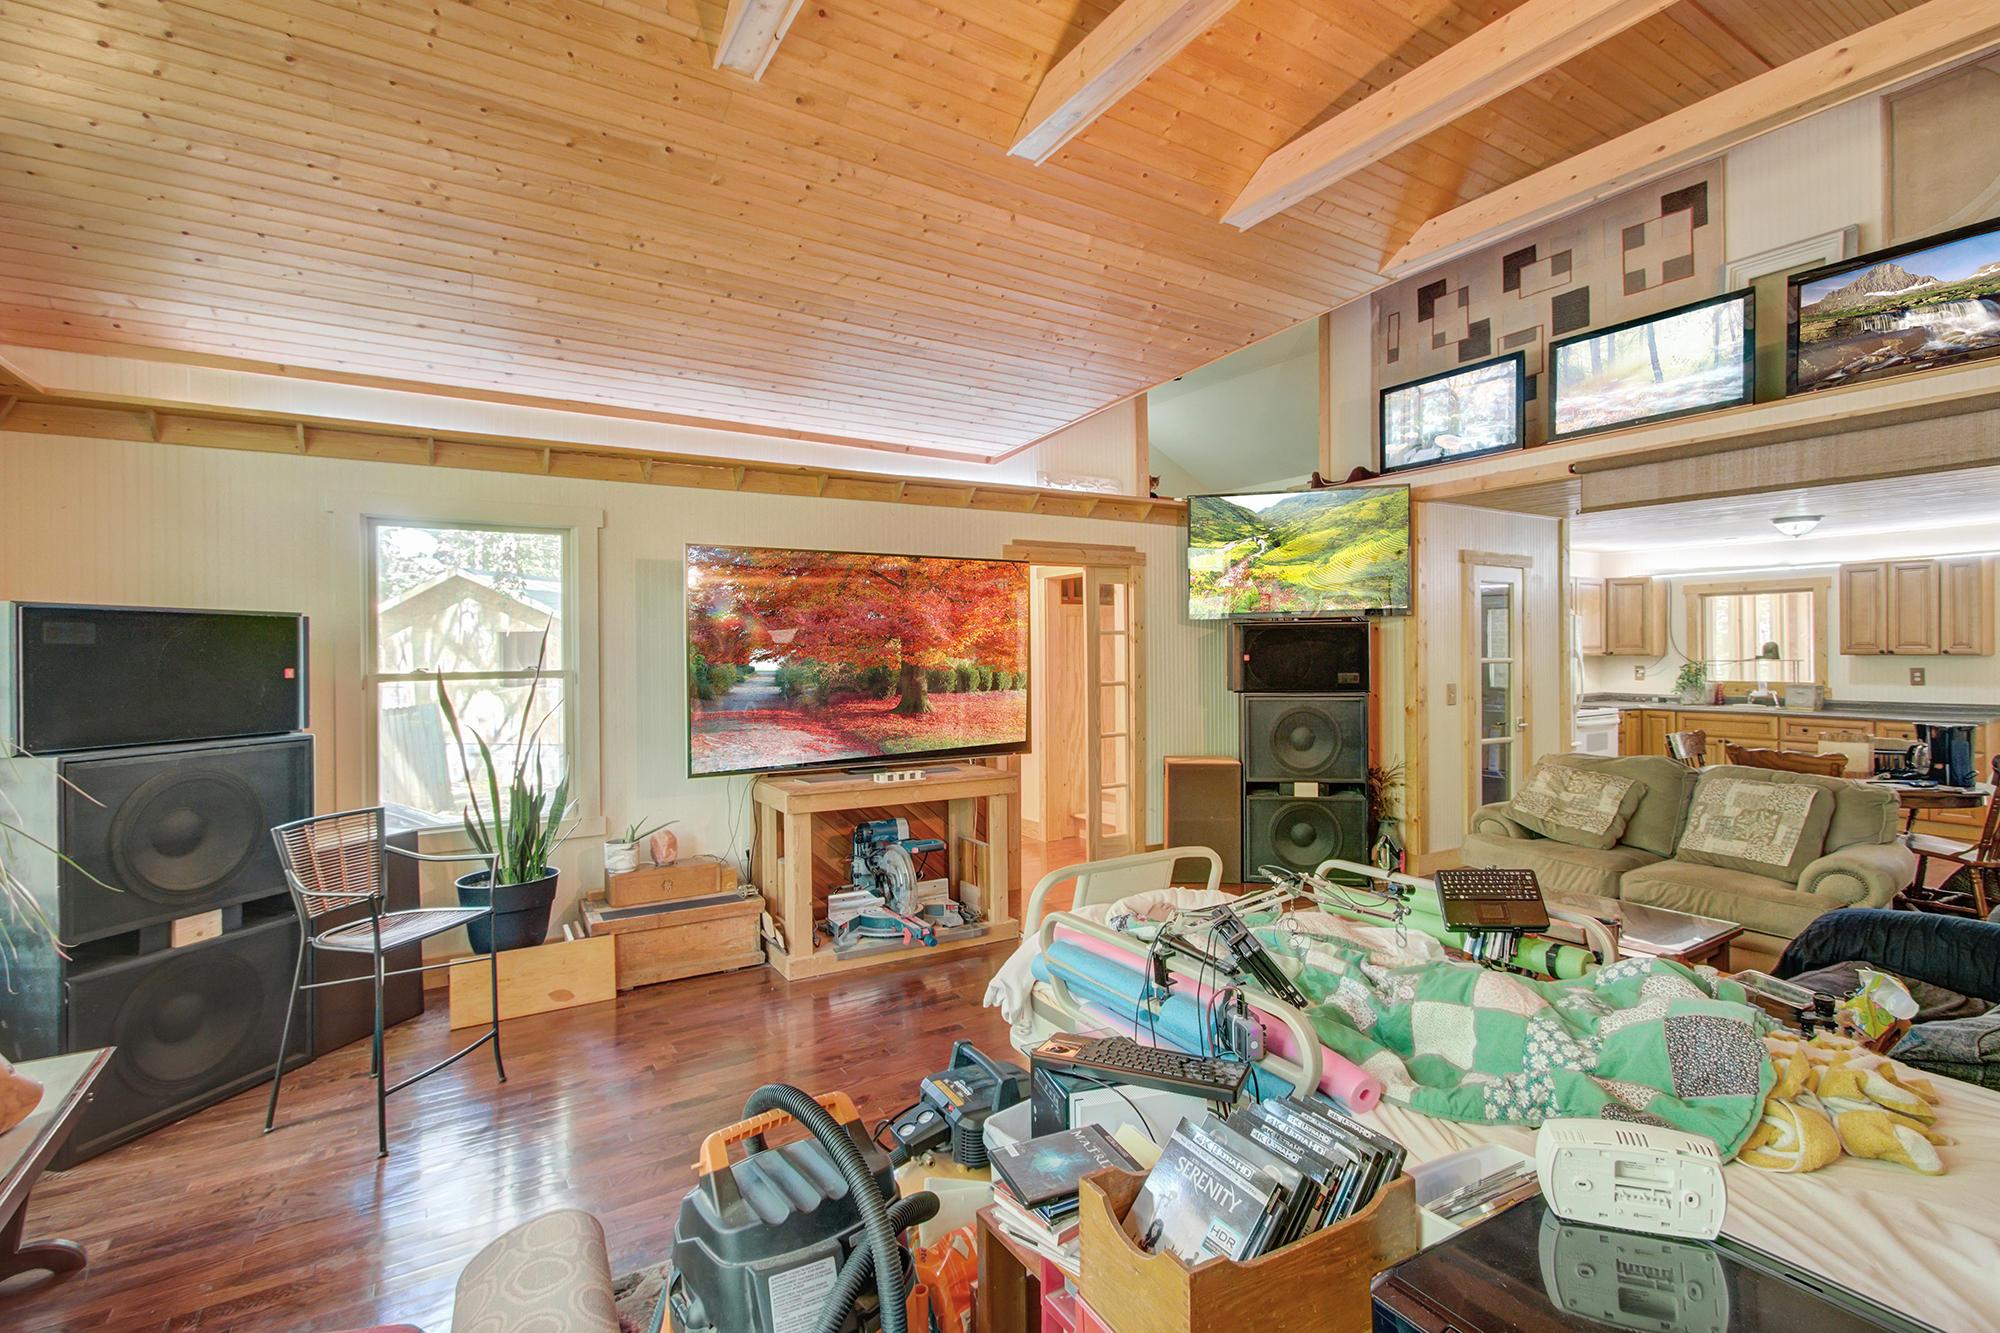 Wando Lakes Homes For Sale - 858 Fairlawn, Mount Pleasant, SC - 9